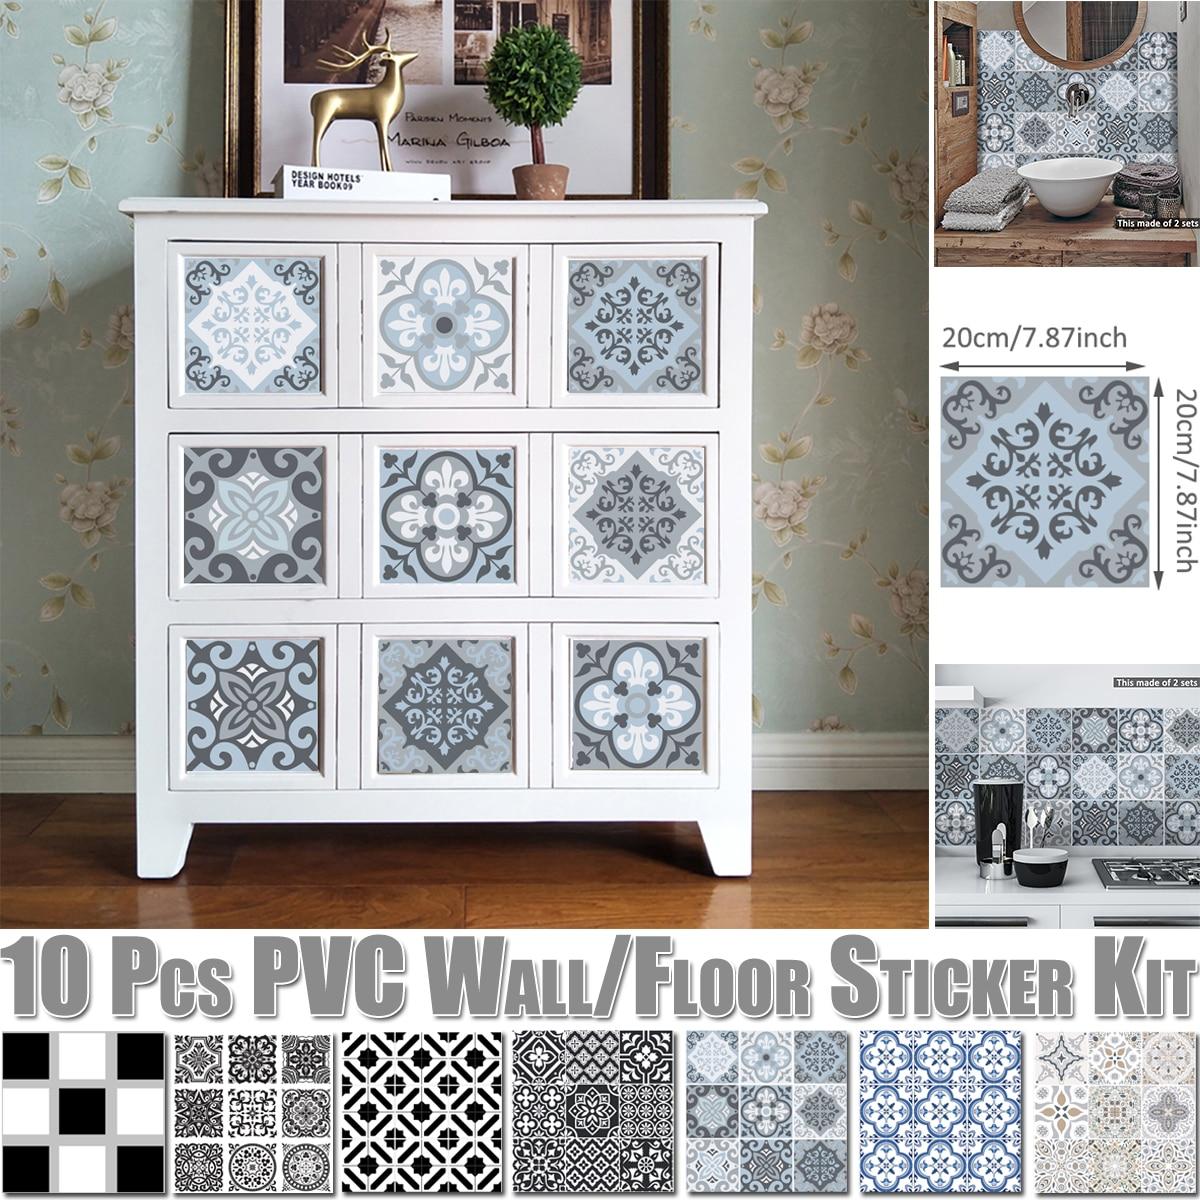 10 piezas/kit de Arte de PVC de Marruecos pegatina de pared a prueba de agua Decoración de cocina azulejos de baño Mural pared ducha muebles etiqueta D30